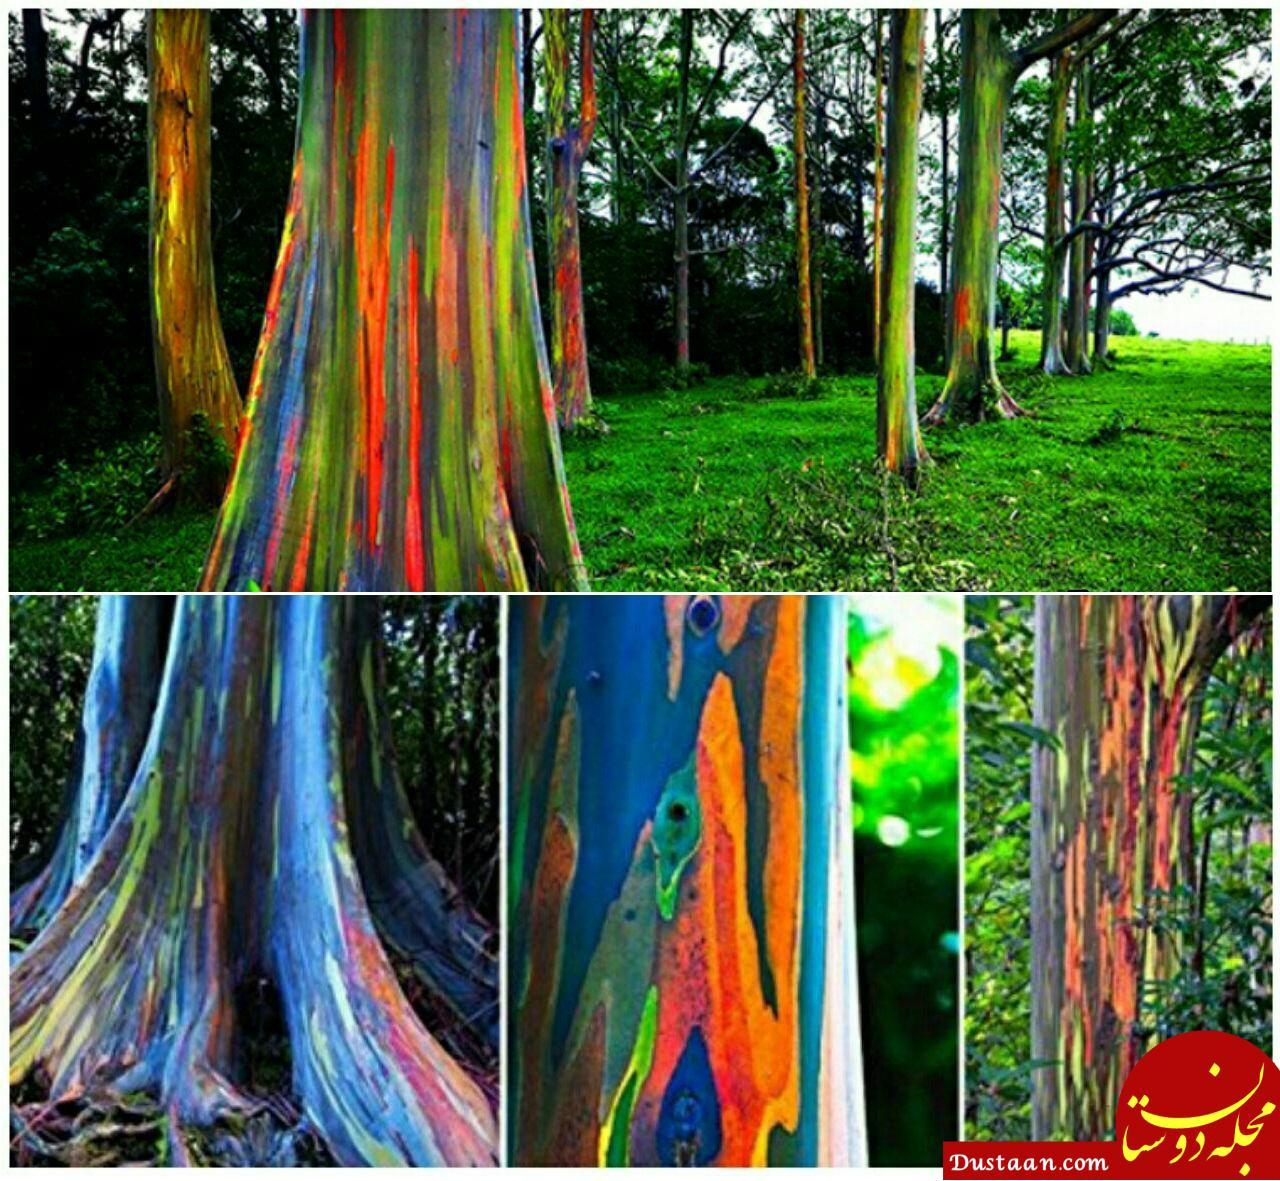 www.dustaan.com تصاویری زیبا از درخت های رنگین کمان!